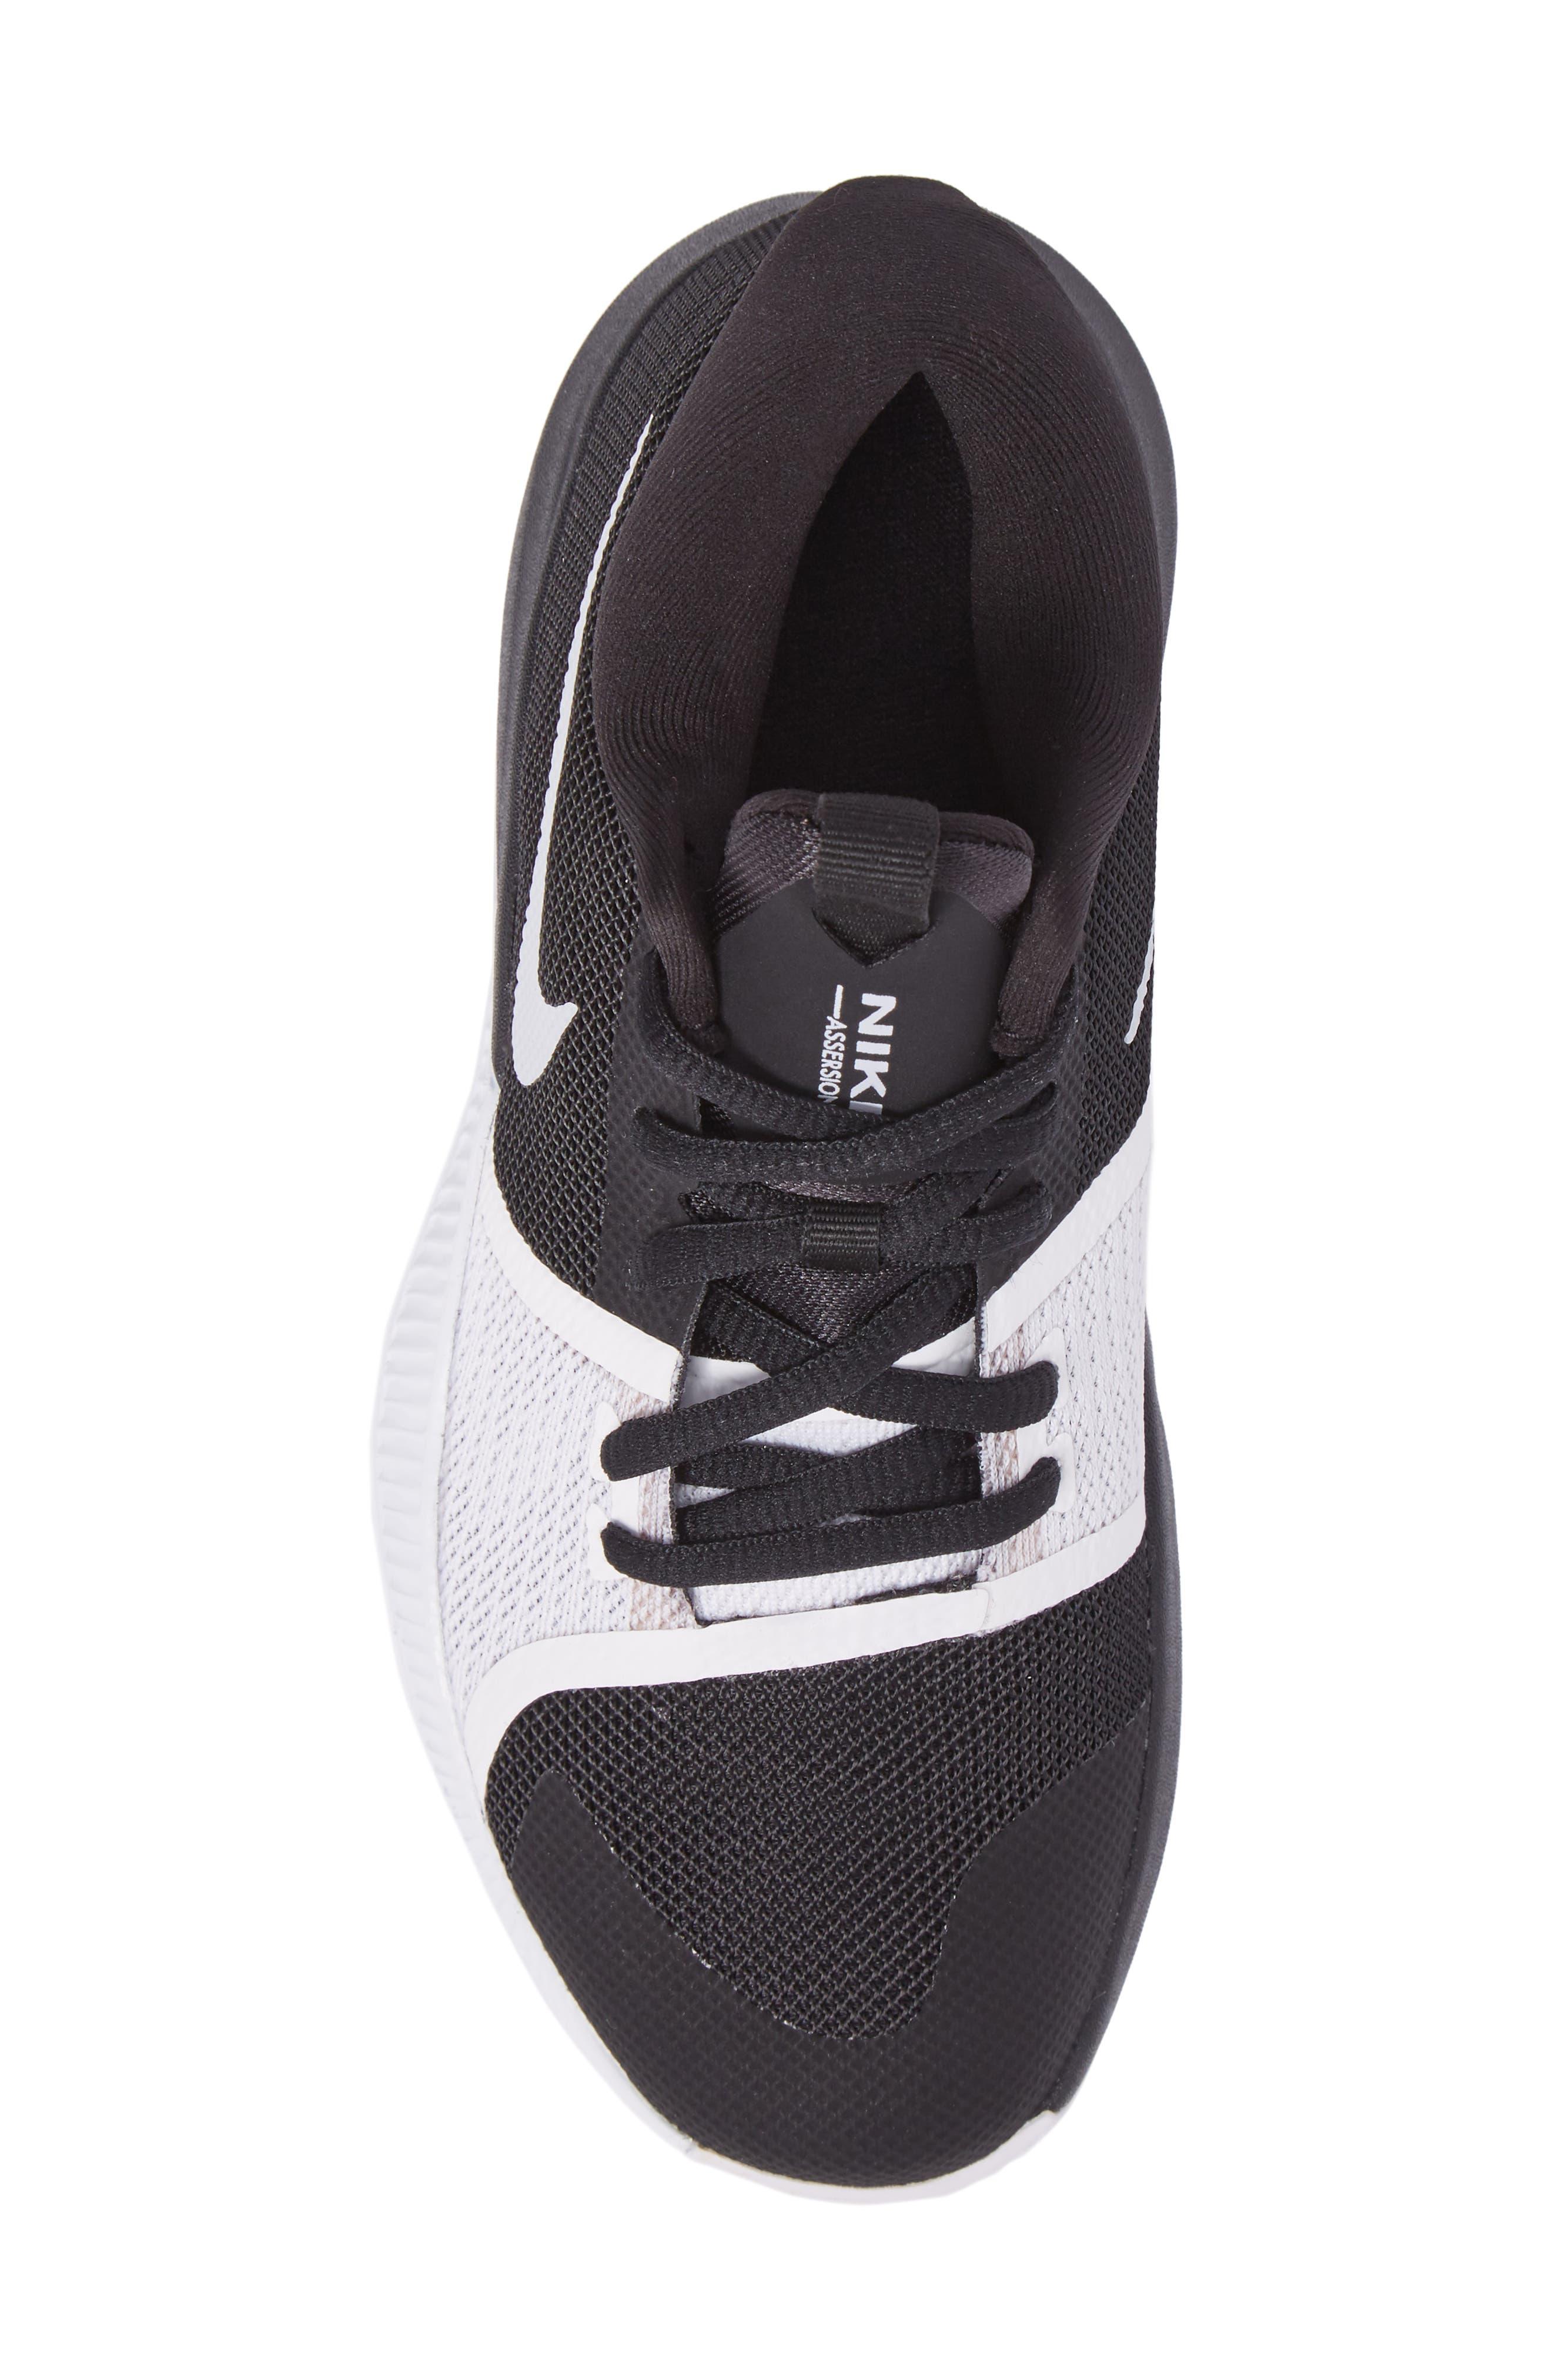 Assersion Sneaker,                             Alternate thumbnail 5, color,                             005